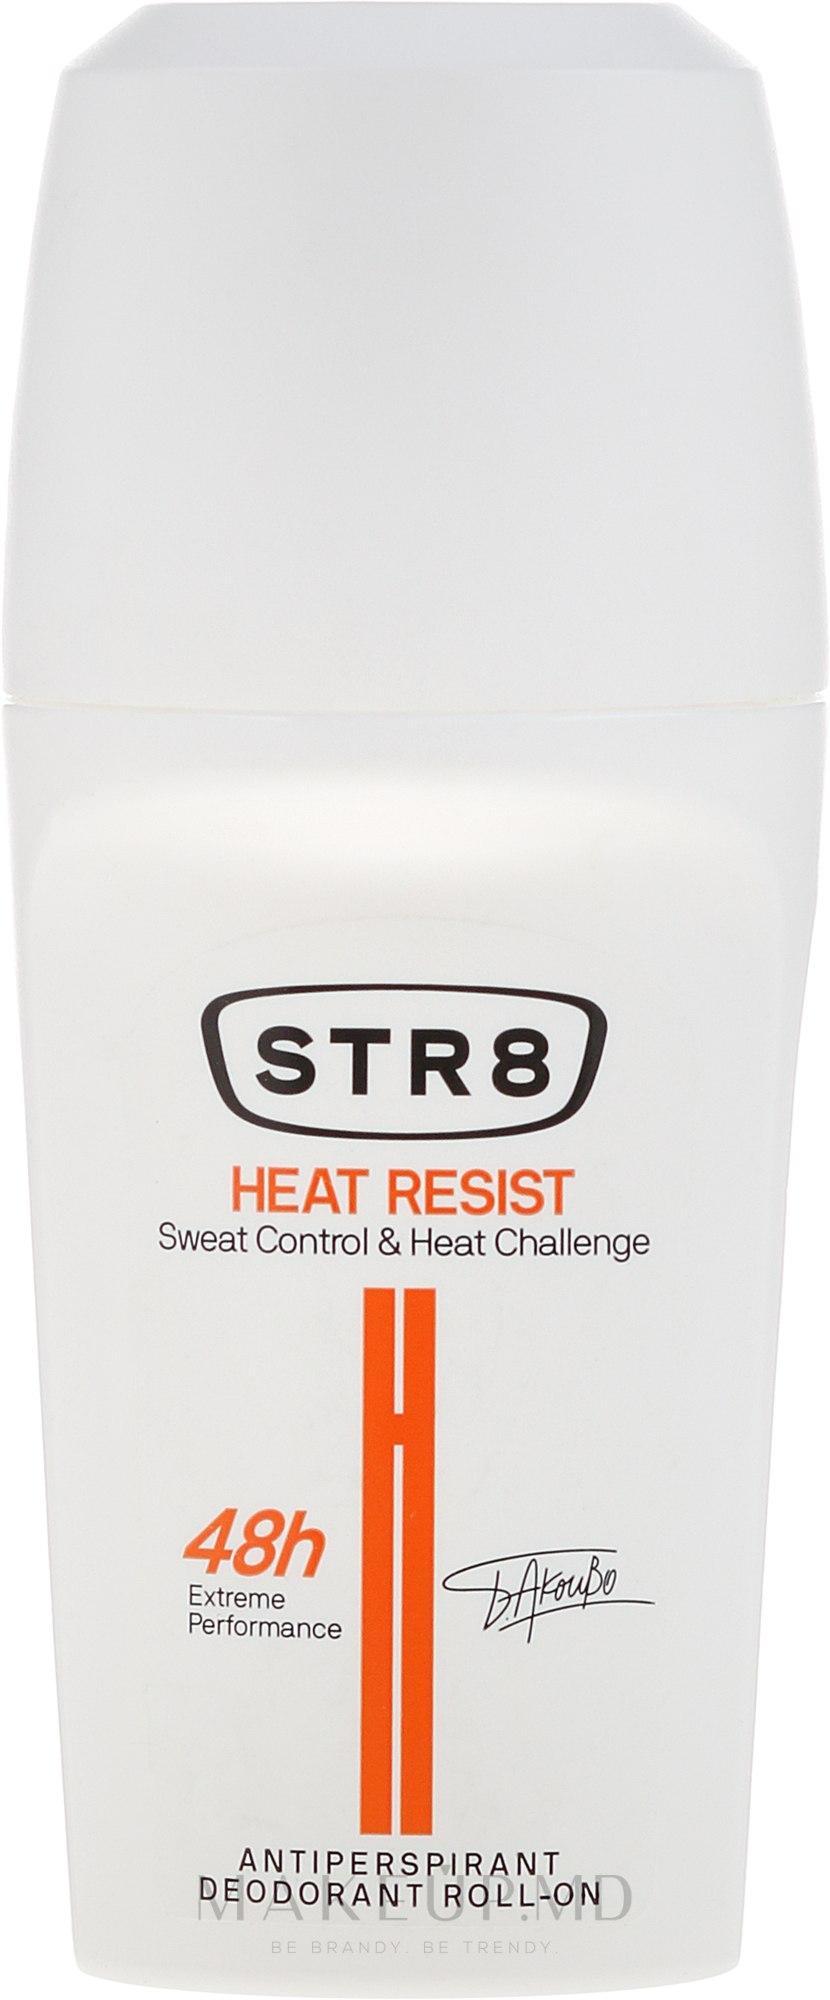 Deodorant roll-on - STR8 Heat Resist Antiperspirant Deodorant Roll-on — Imagine 50 ml